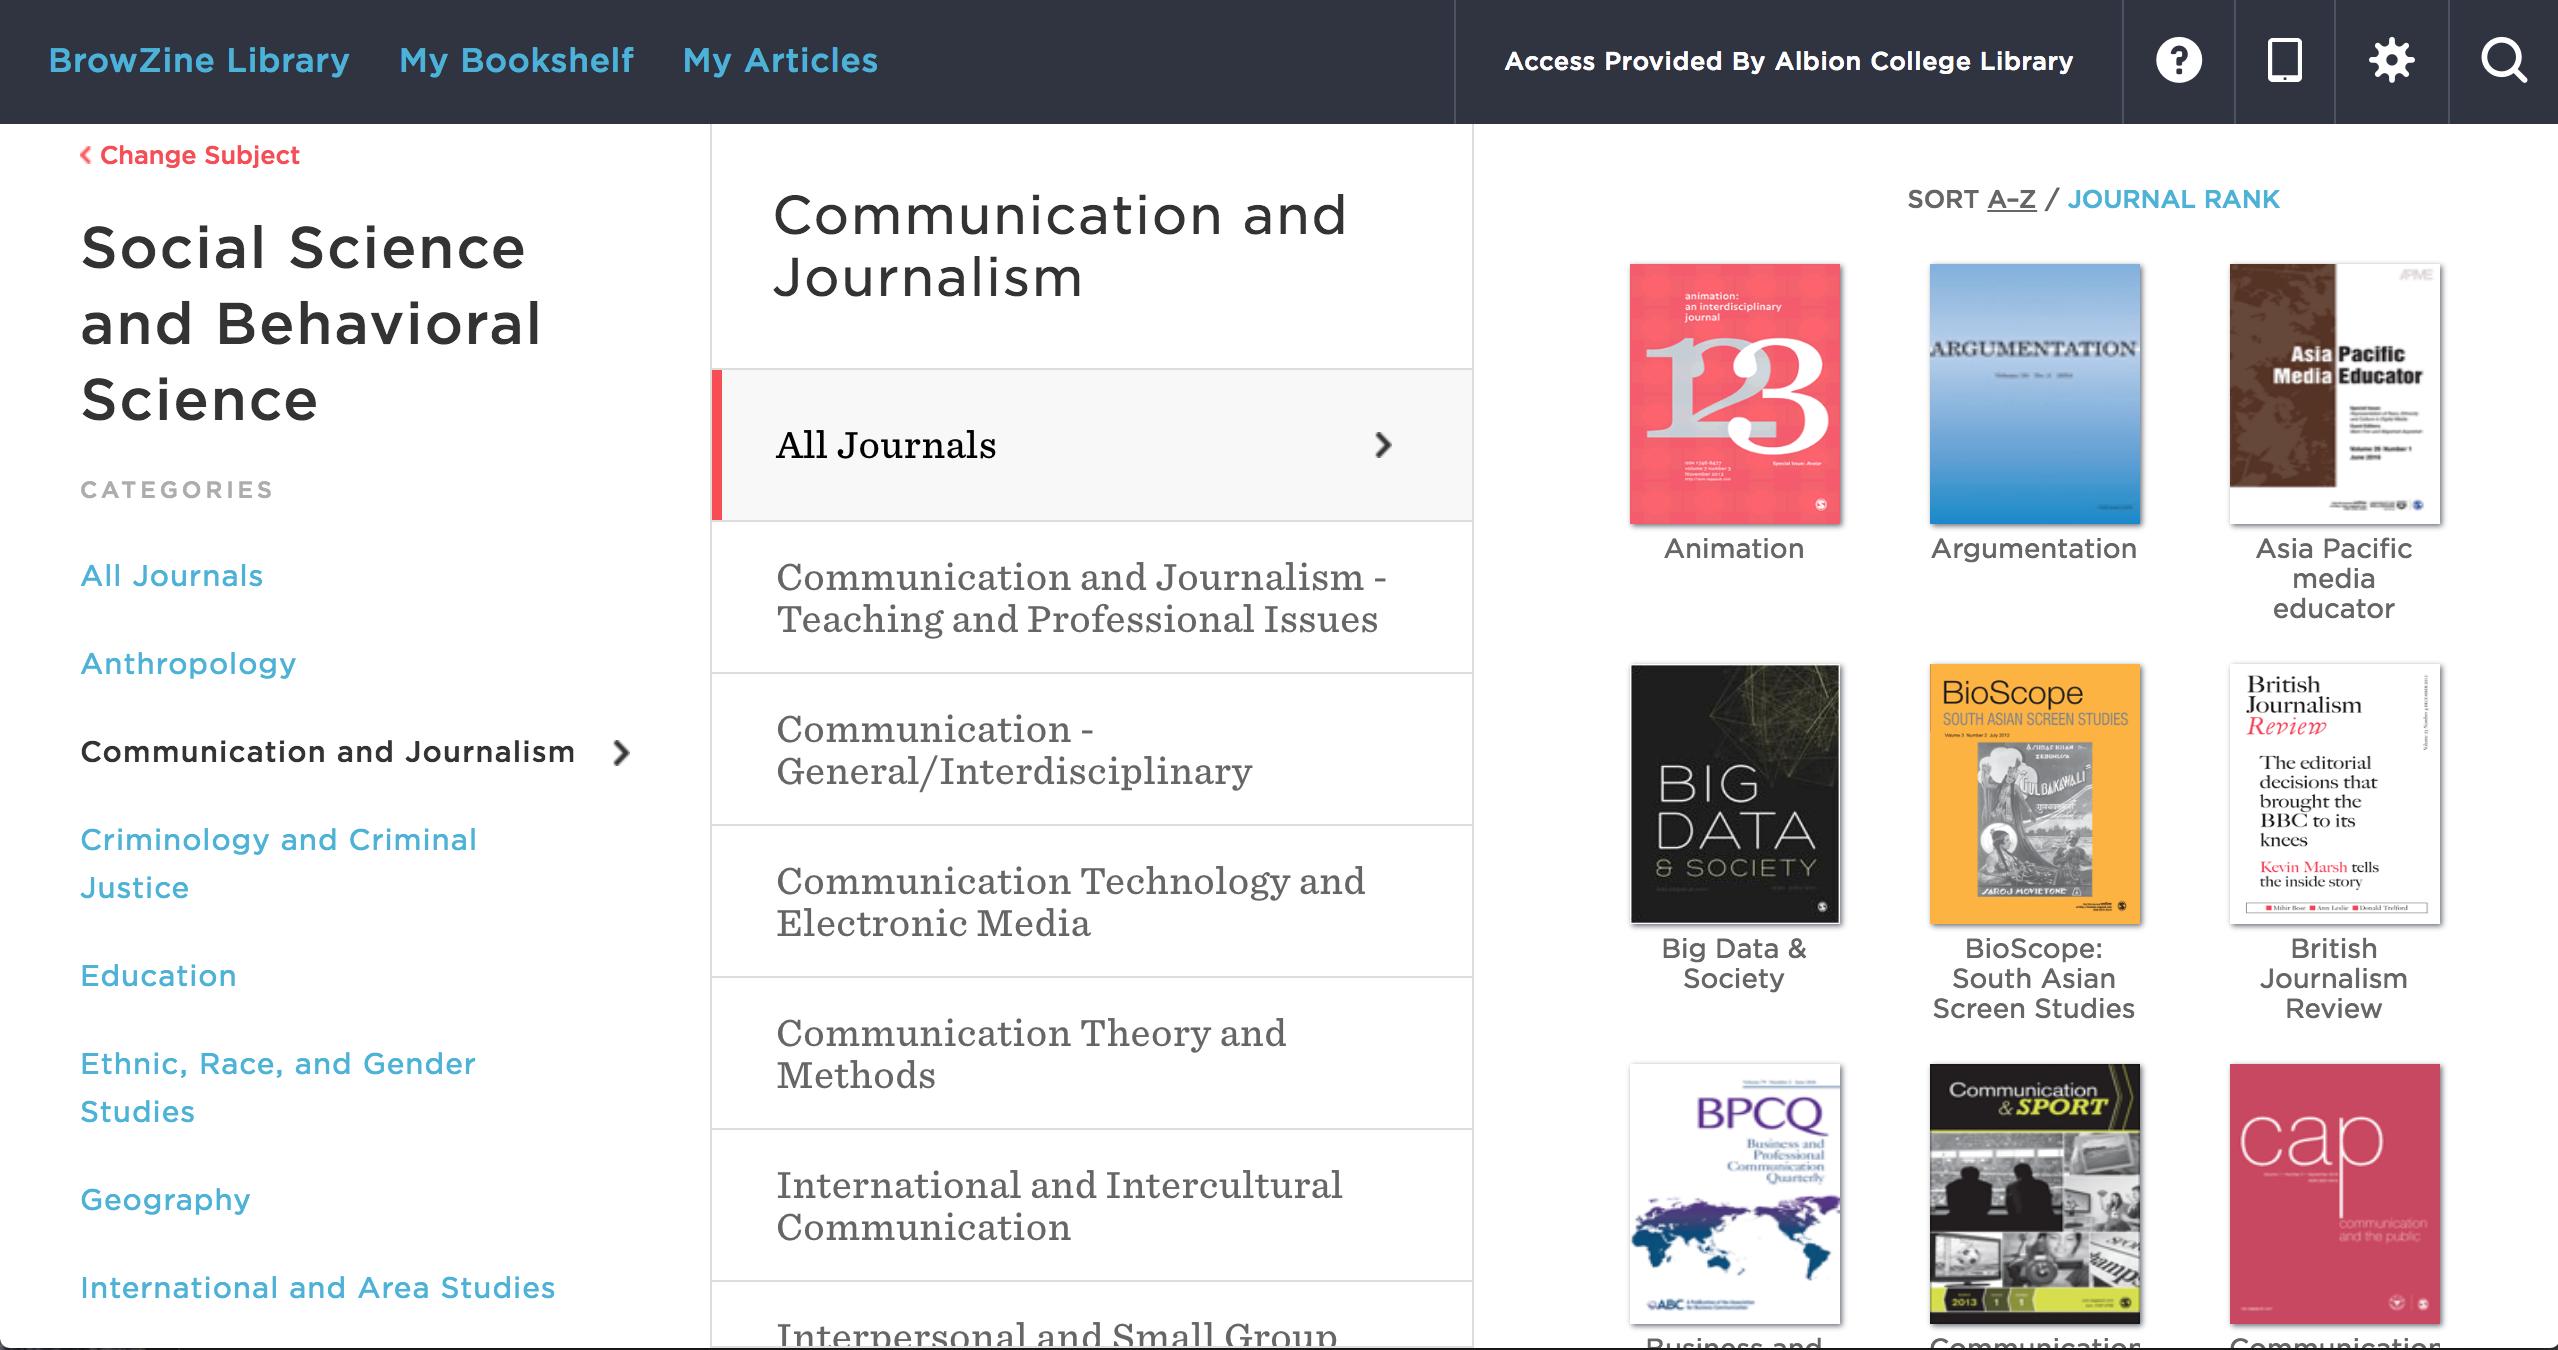 Communication Studies Journals in BrowZine